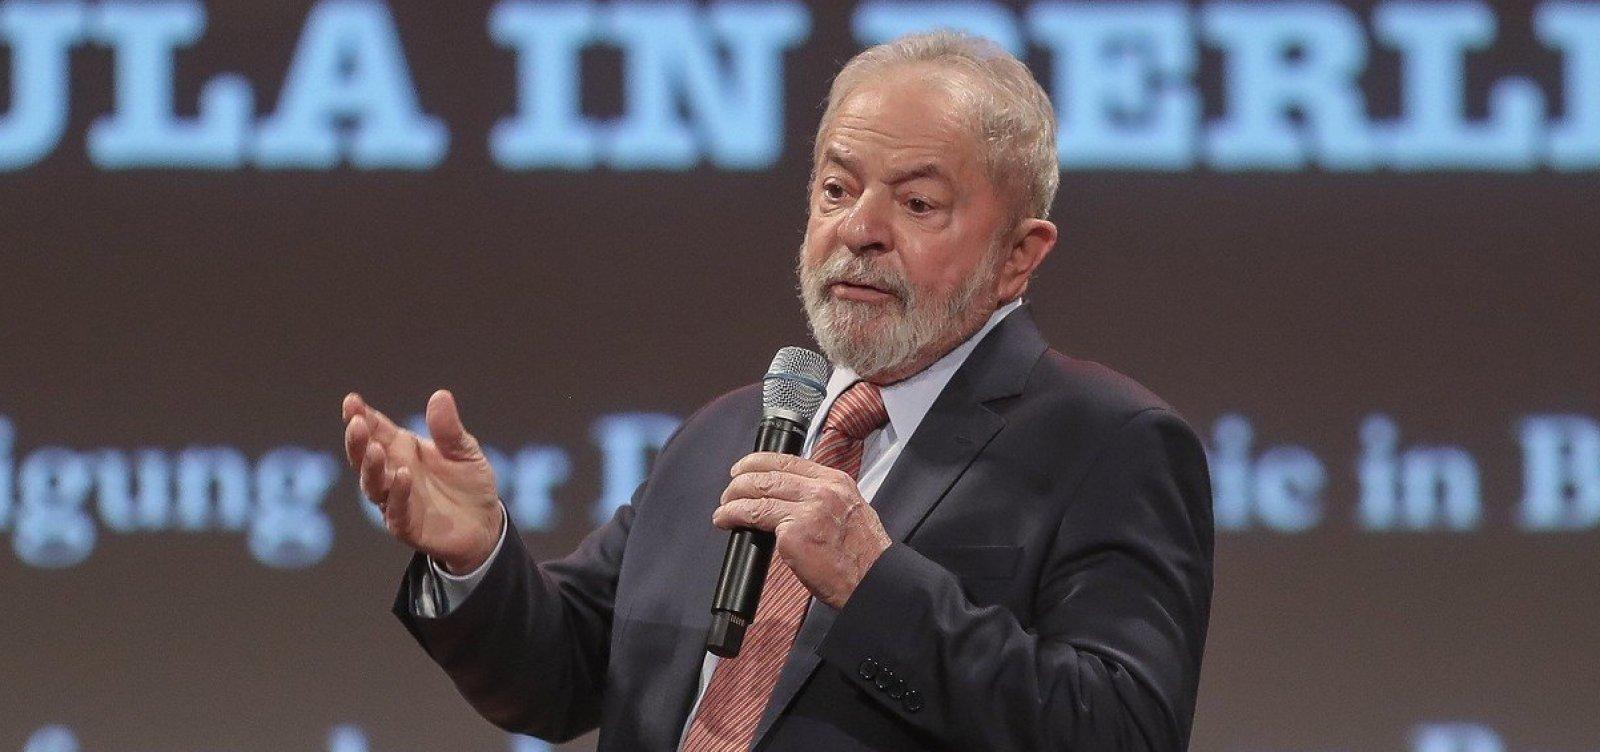 Lewandowski libera a Lula acesso a provas obtidas pela Lava-Jato